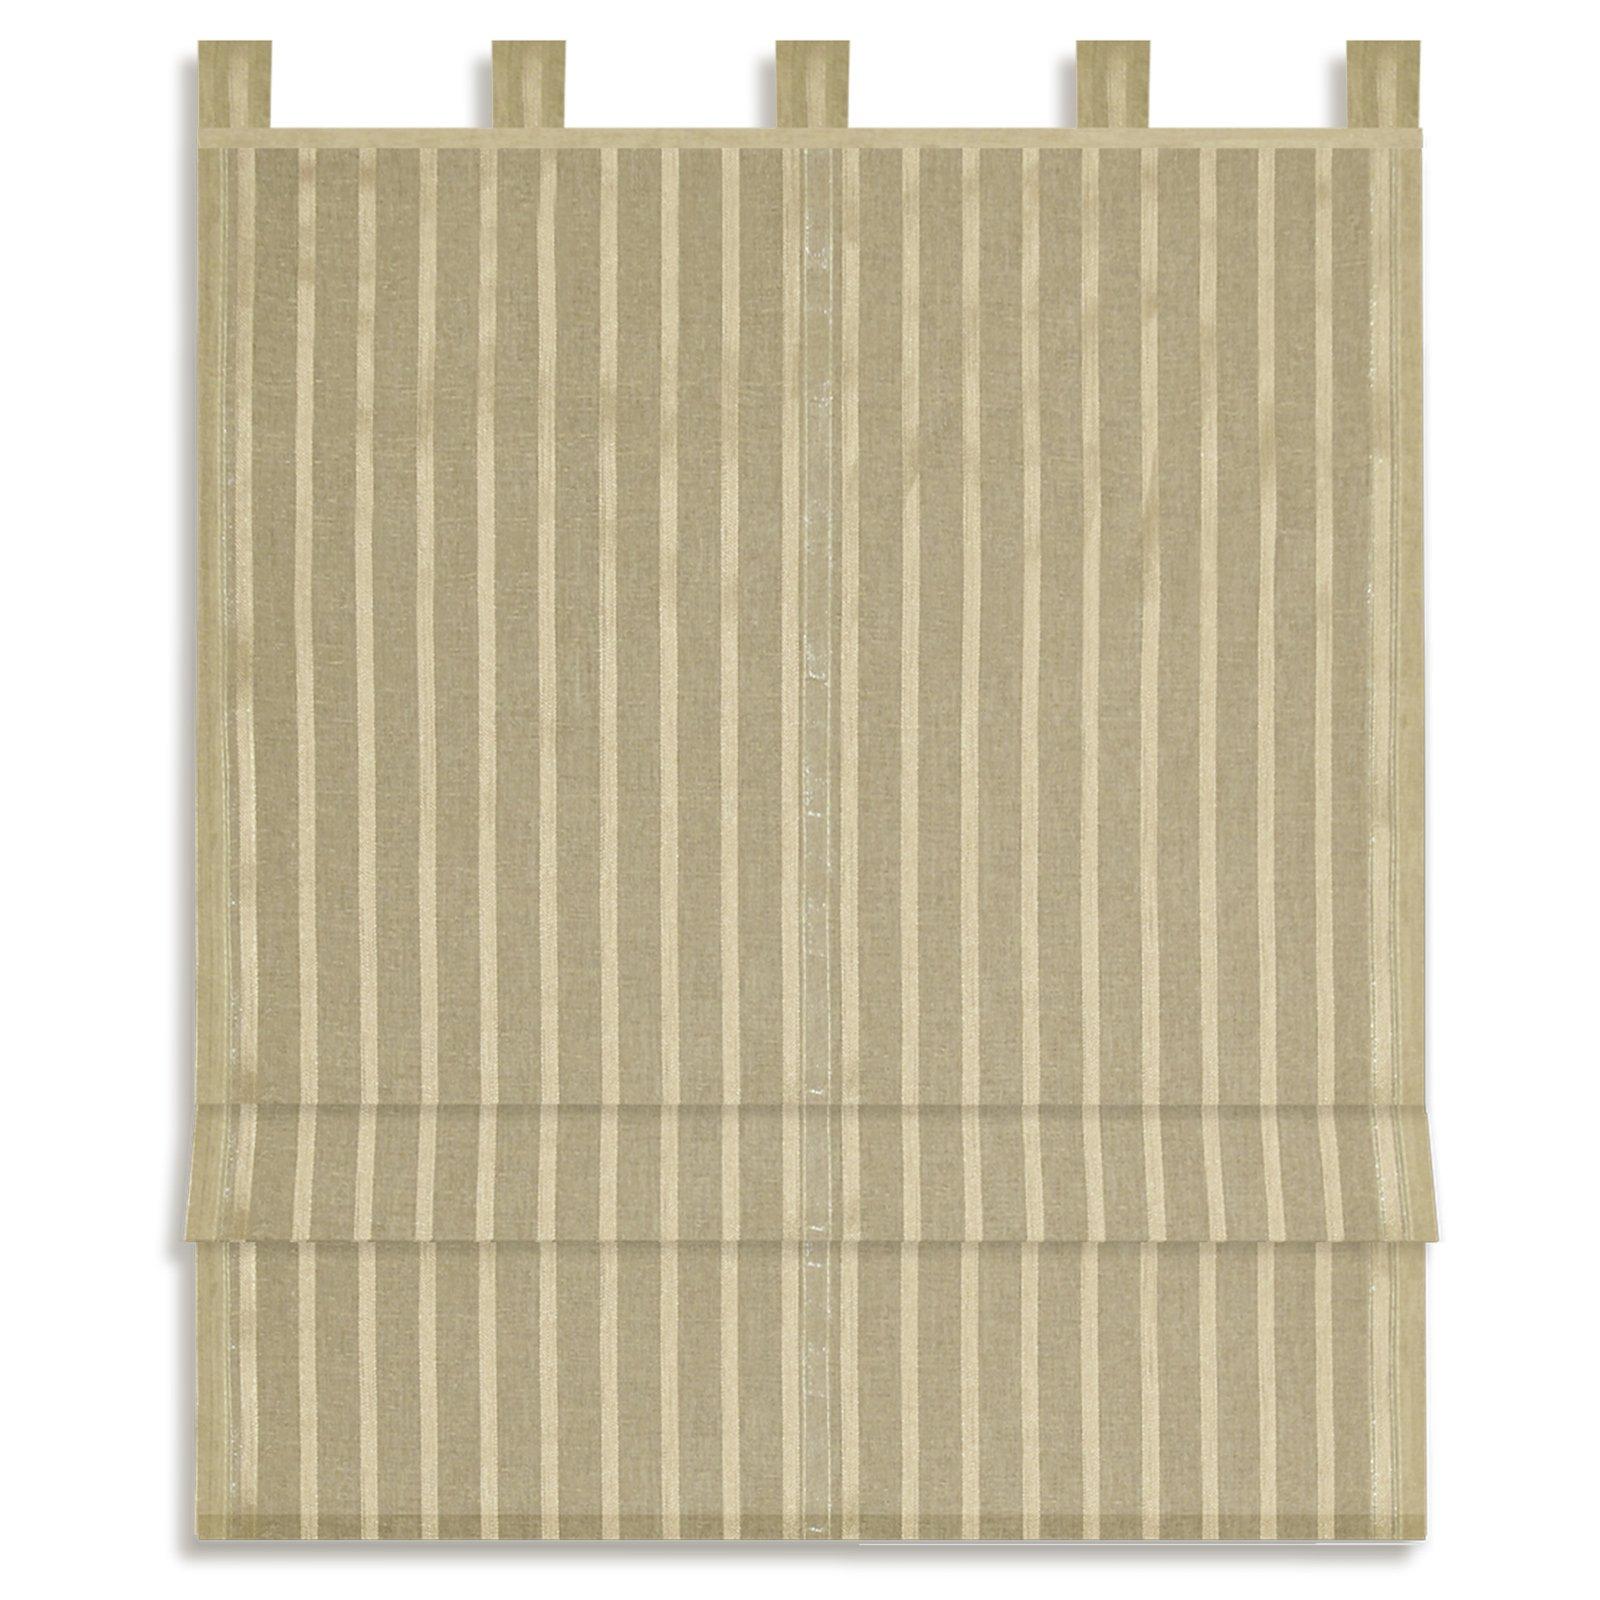 raffrollo bella taupe 60x140 cm sichtschutz raffrollos raffrollos rollos jalousien. Black Bedroom Furniture Sets. Home Design Ideas